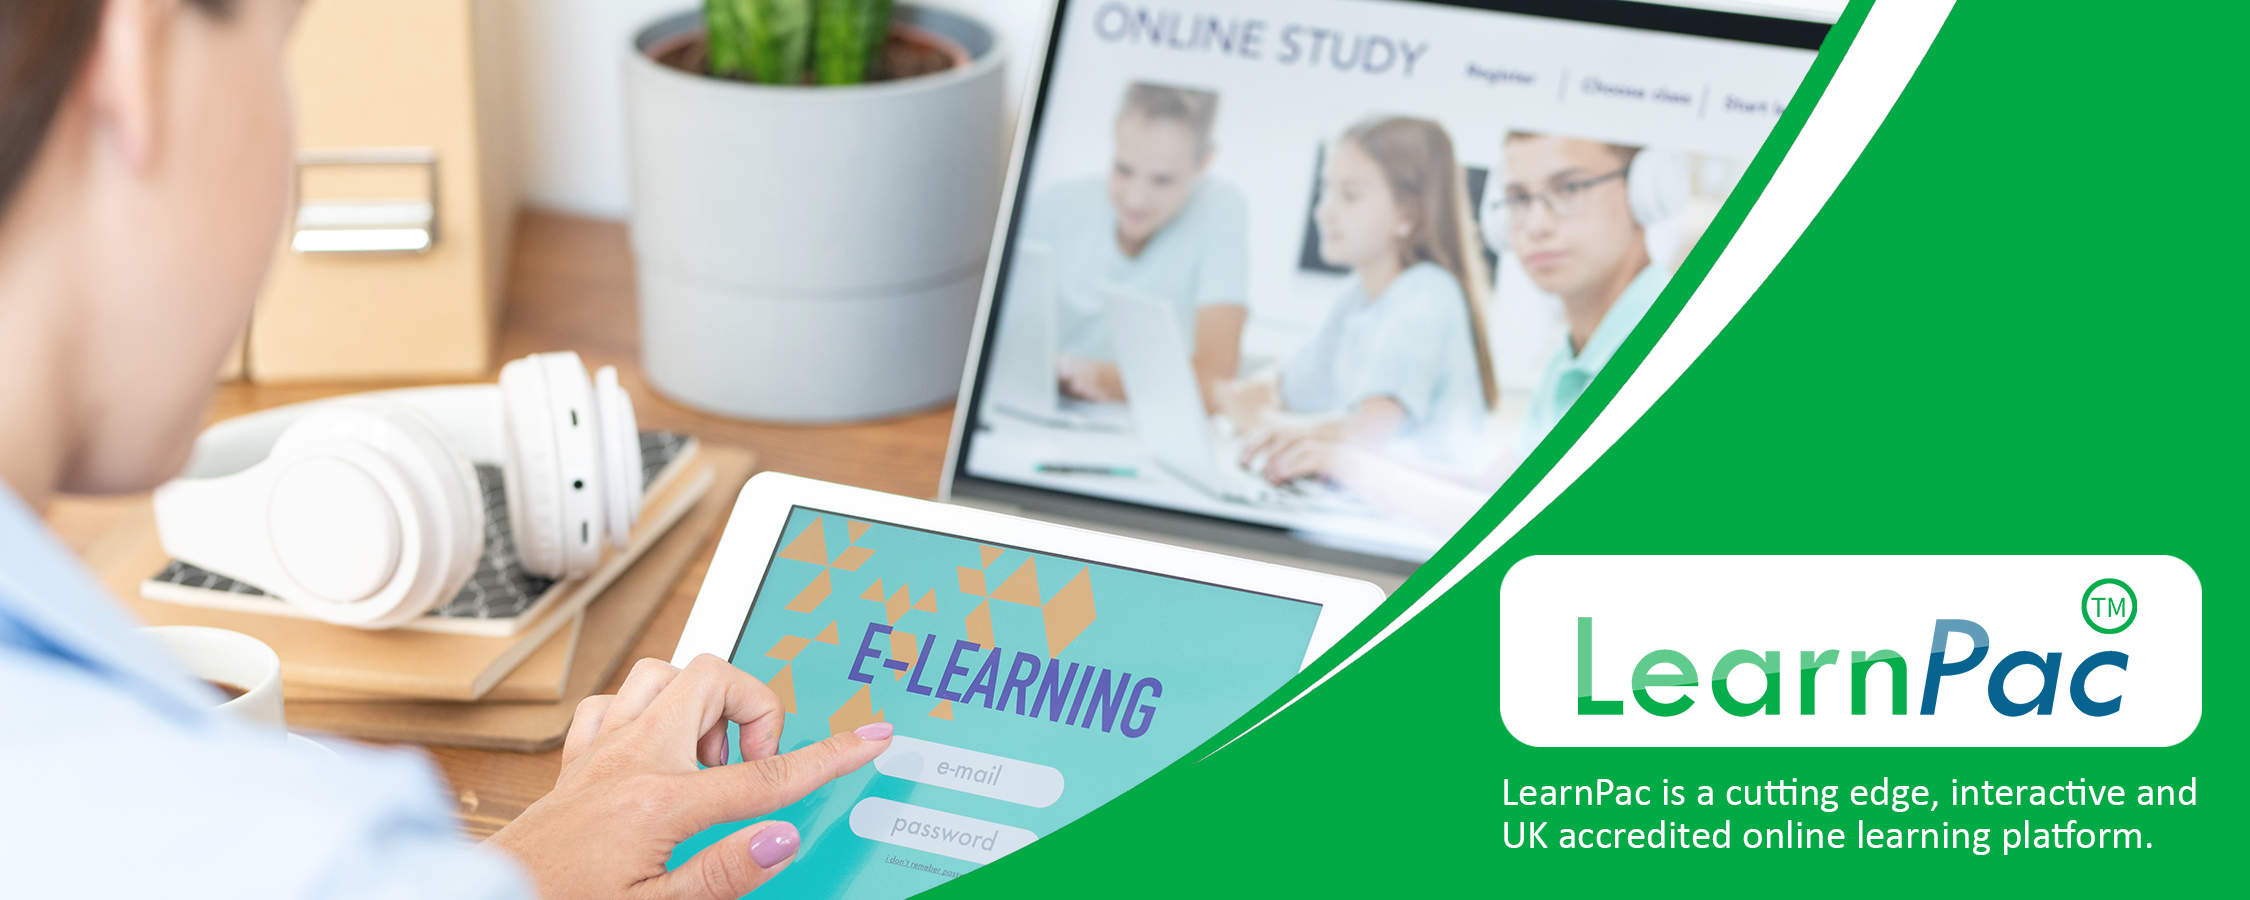 Adult Learning – Mental Skills Training - Online Learning Courses - E-Learning Courses - LearnPac Systems UK -